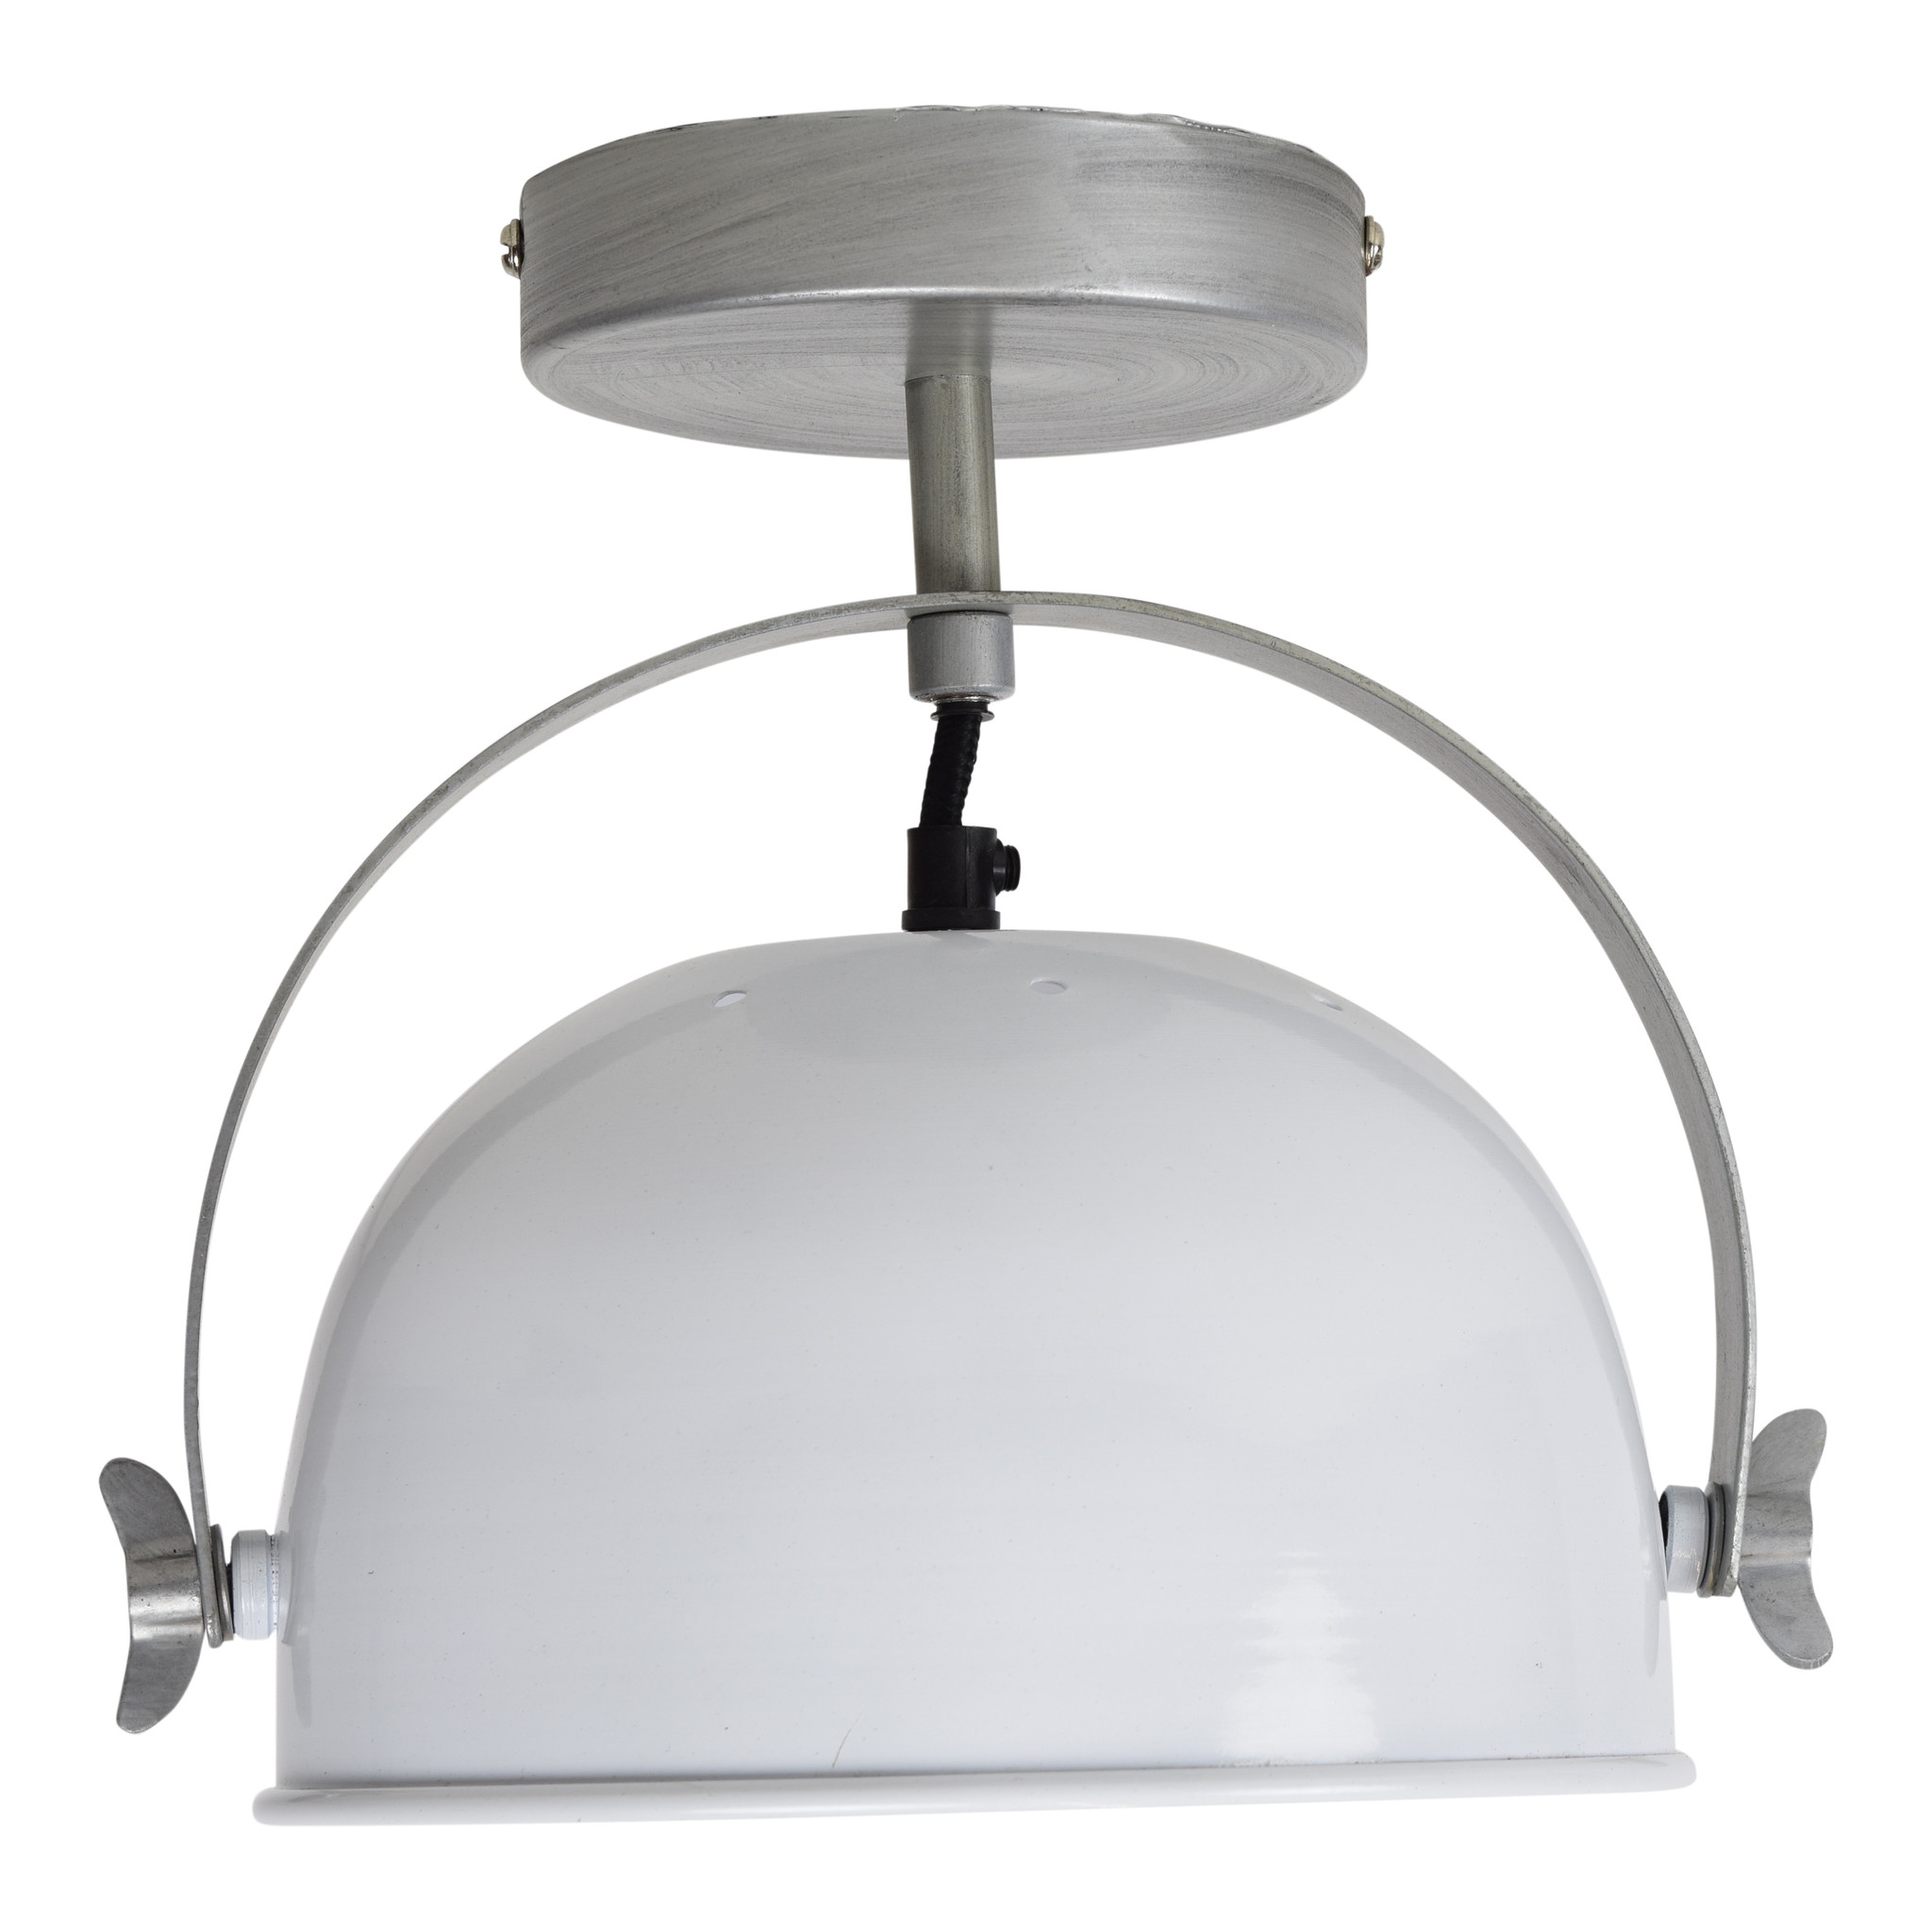 Urban Interiors Urban Interiors Plafondlamp Retro ø22cm Glossy white-AI-WL-10-W-PL-8718868314949